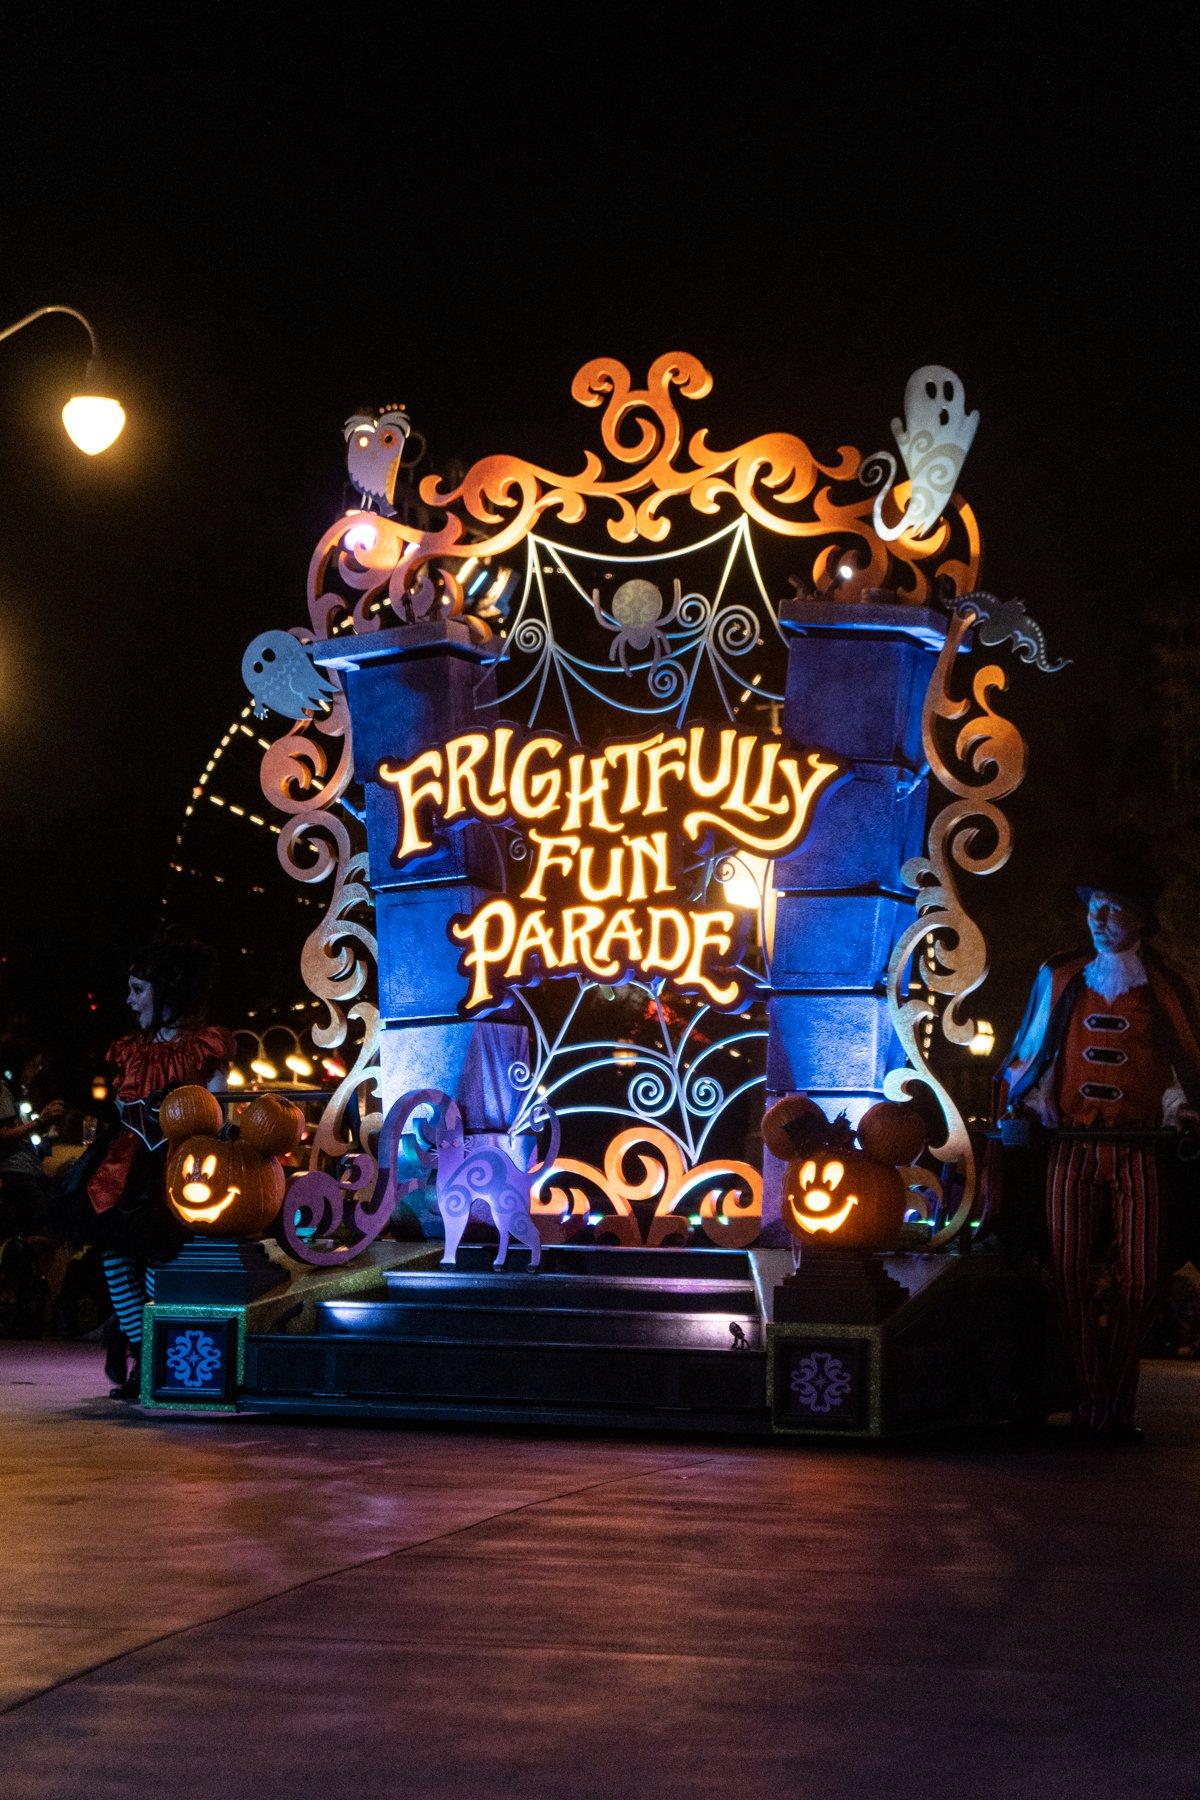 Disneyland Halloween parade float